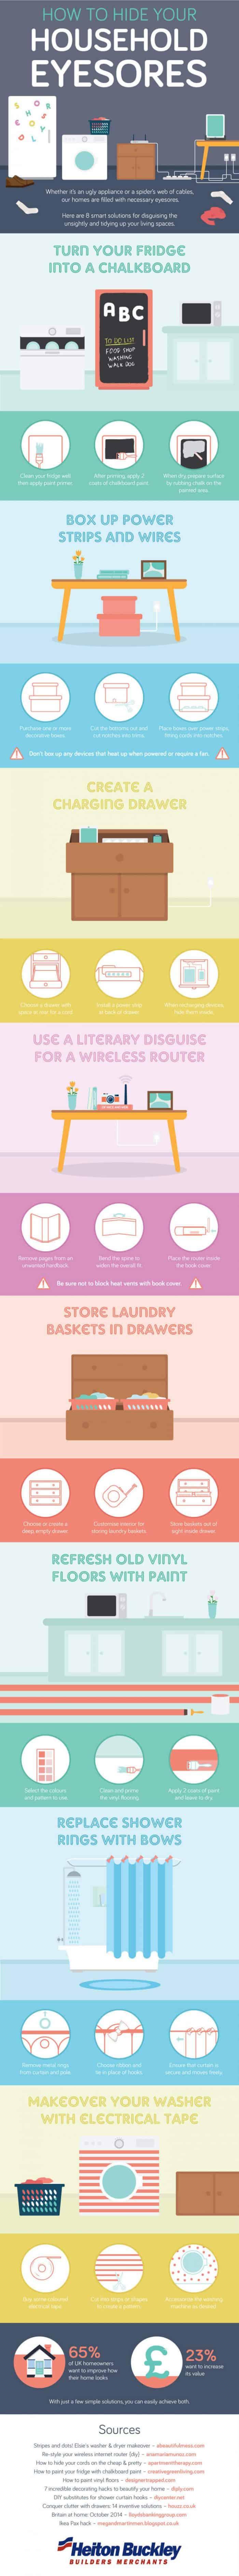 Tricks to hide household eyesores